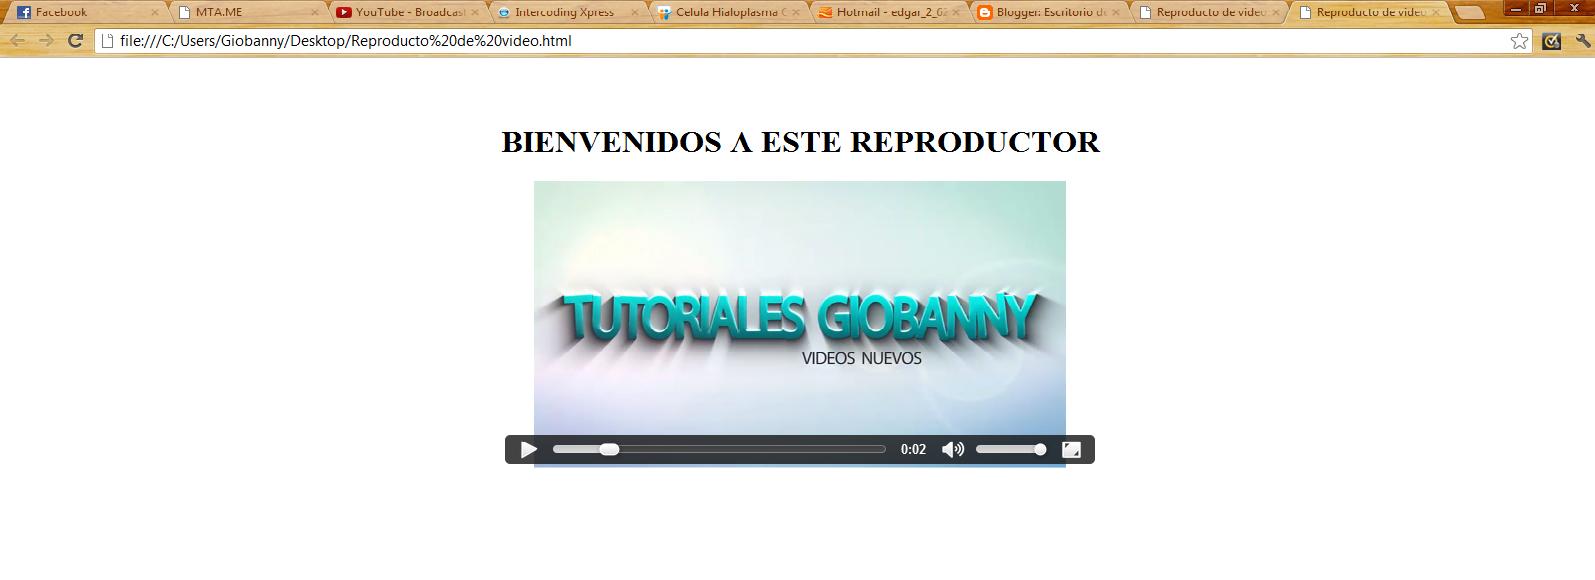 codigo html reproductor: